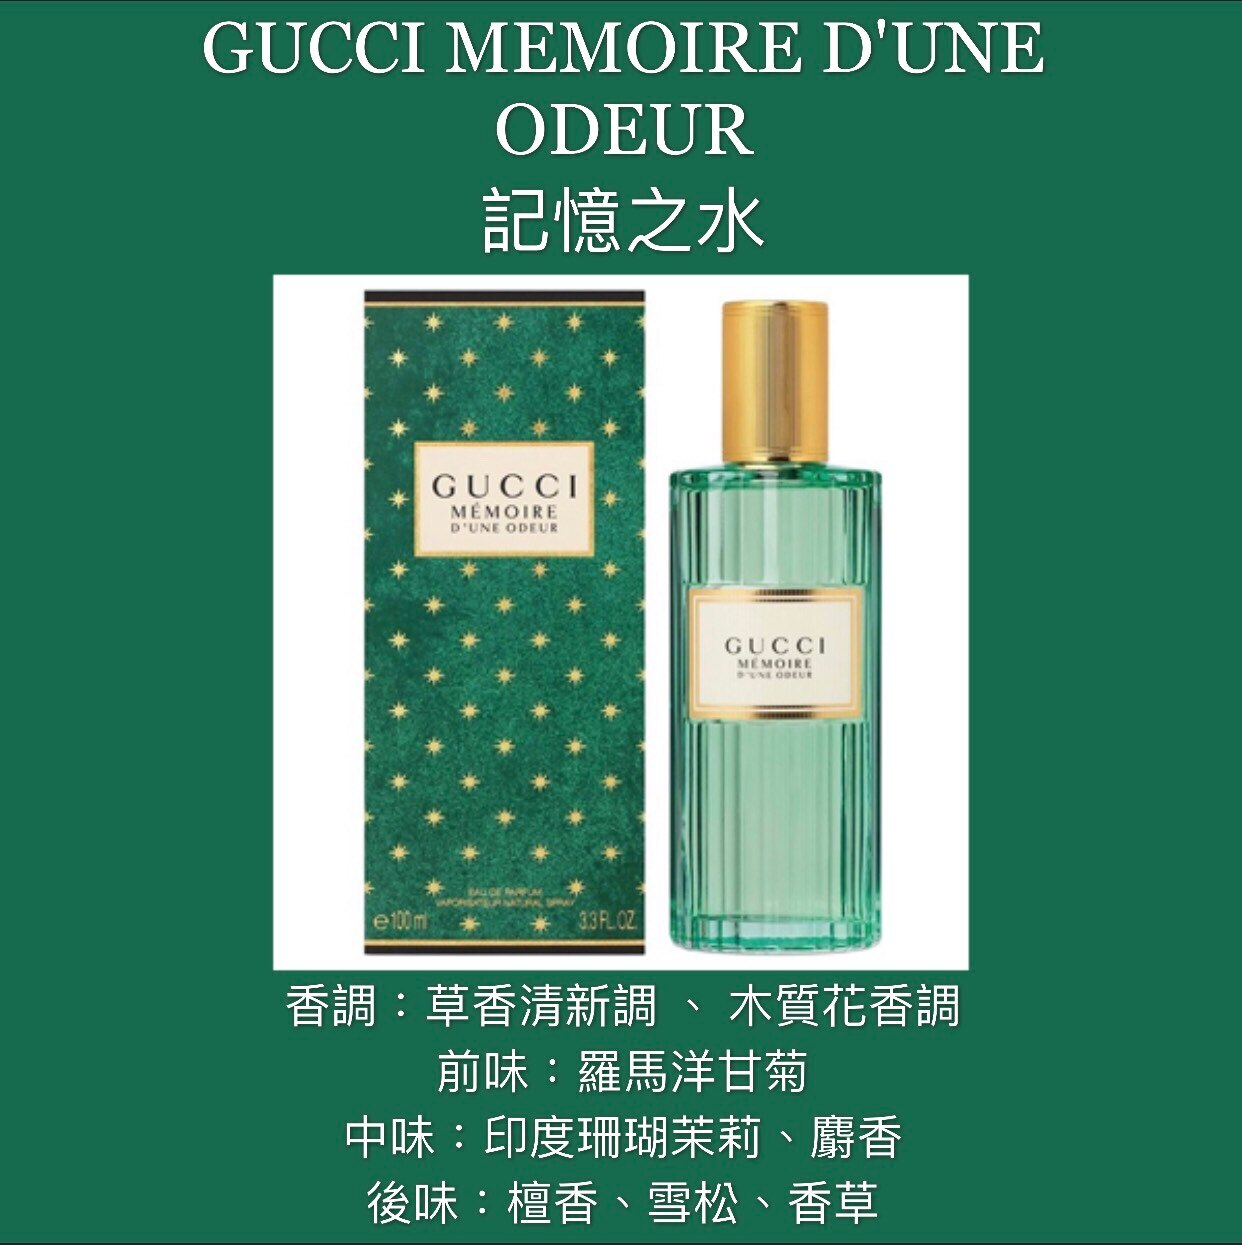 【香舍】Gucci Memoire D'une Odeur記憶之水 中性淡香精